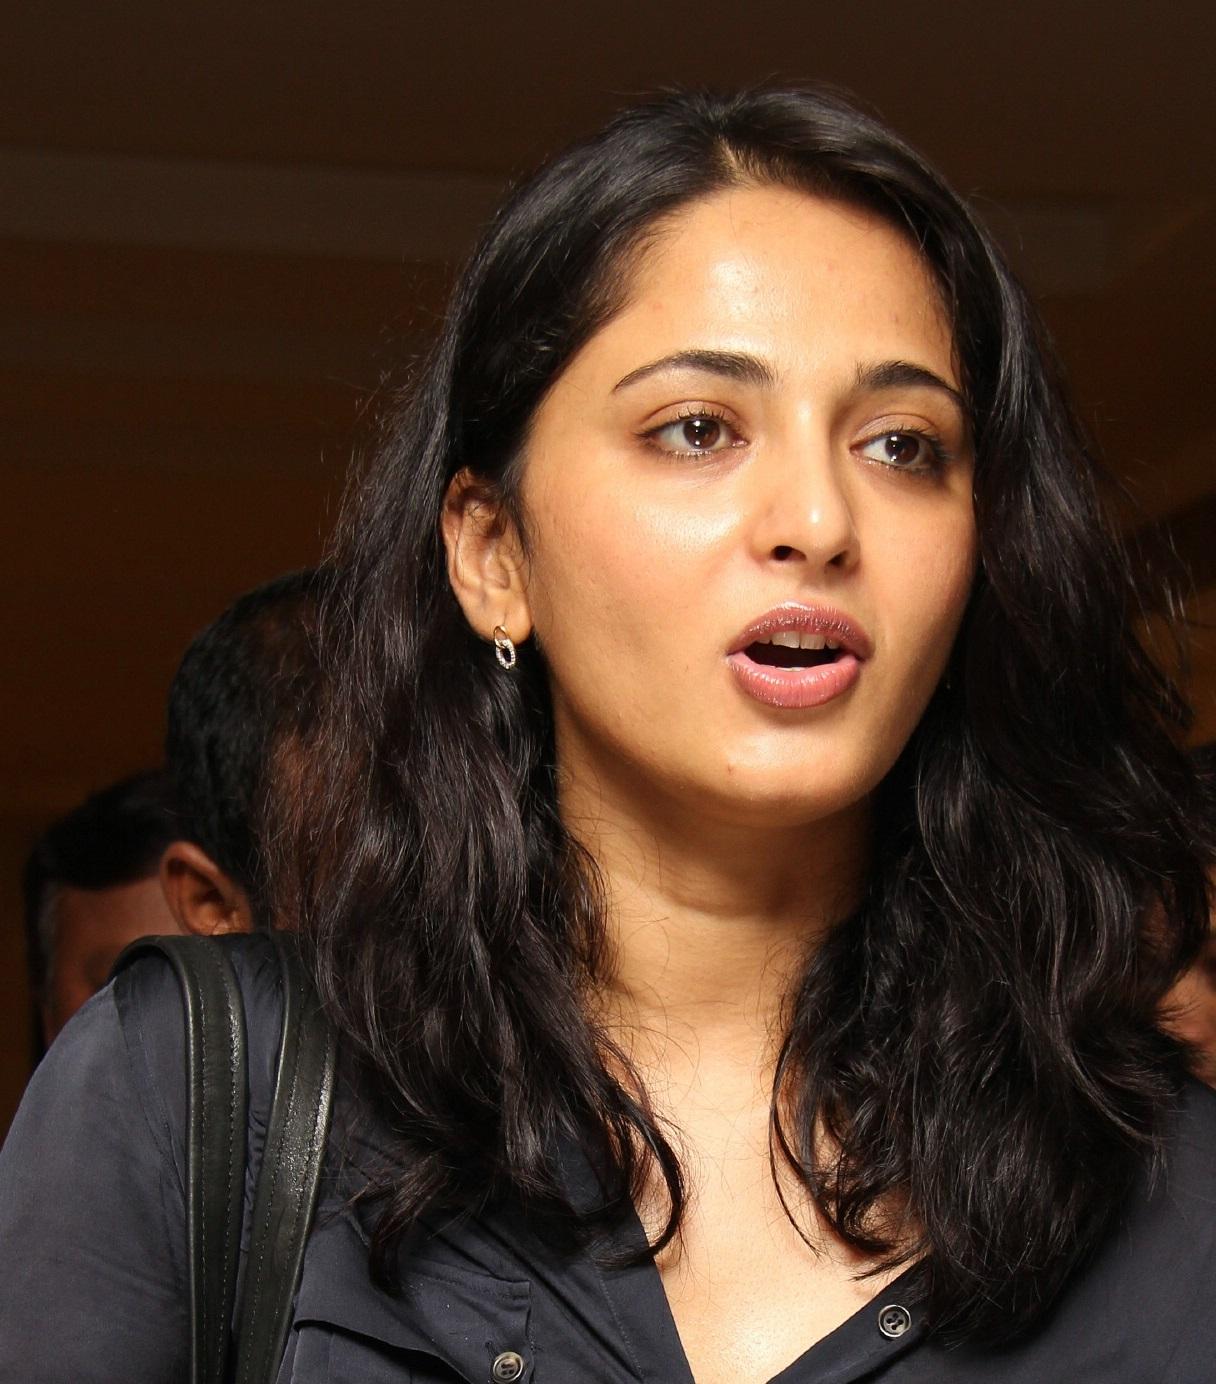 Anushka Shetty Oil Face Close Up Stills